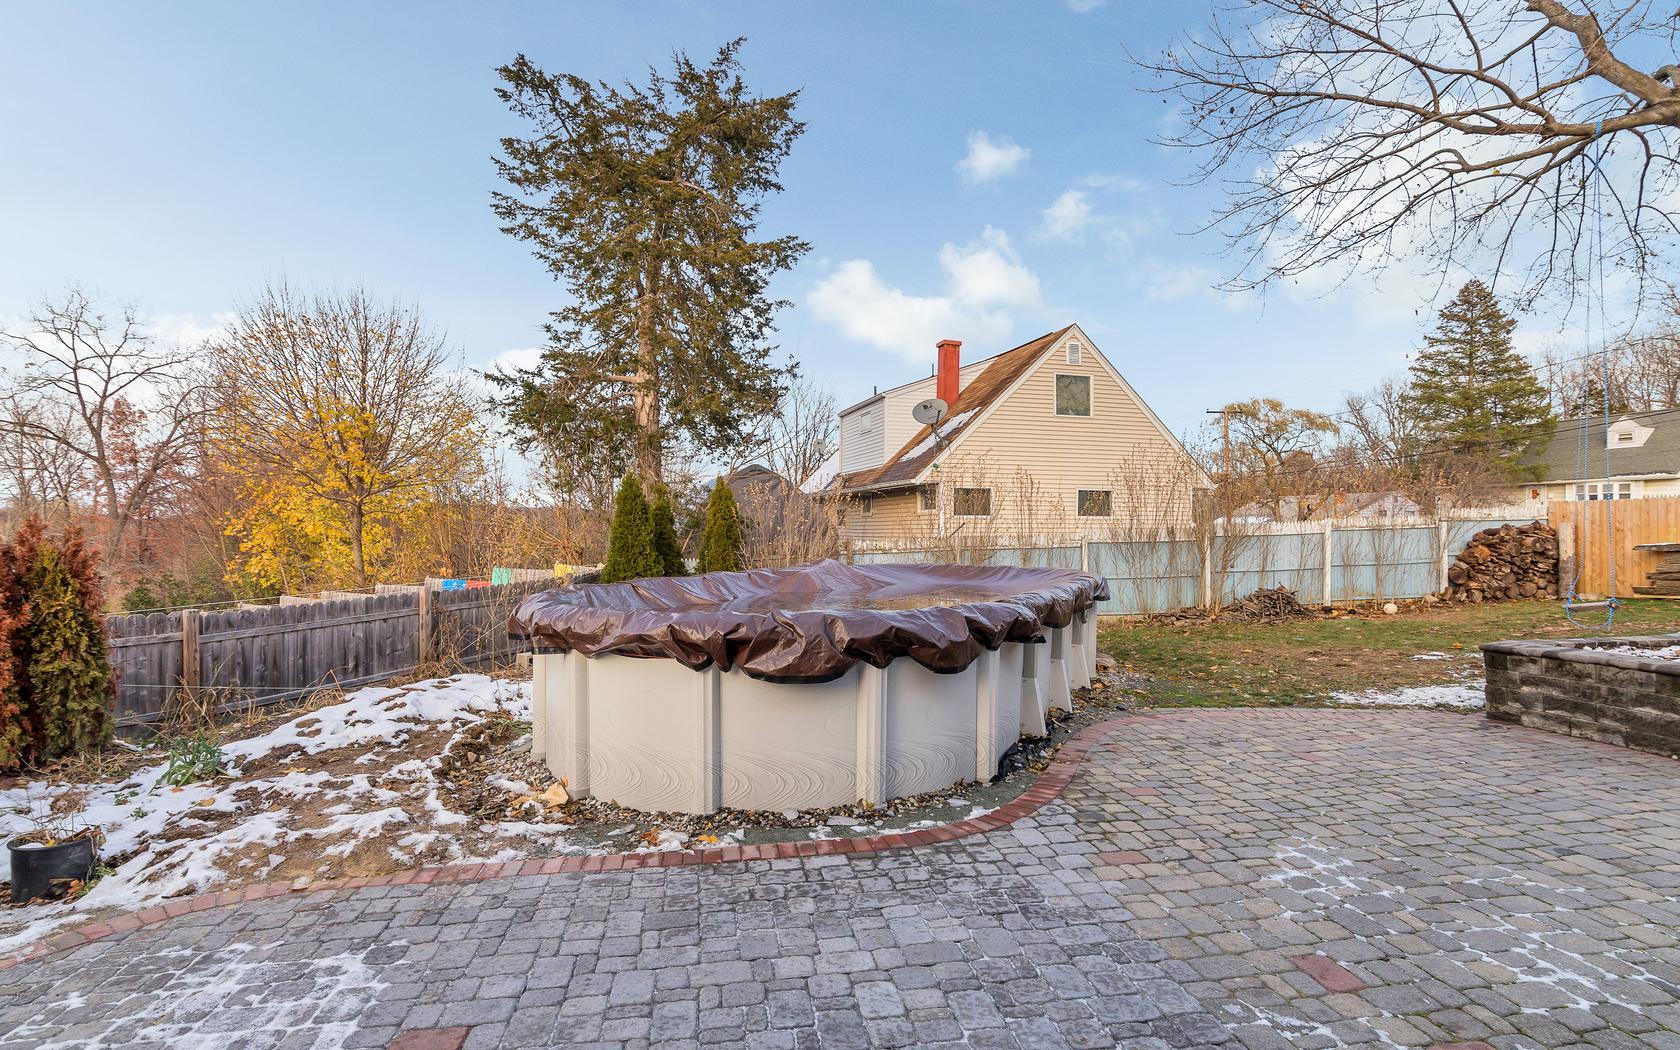 31 Delaware Rd Newburgh Ny 12550 Real Estate Tour